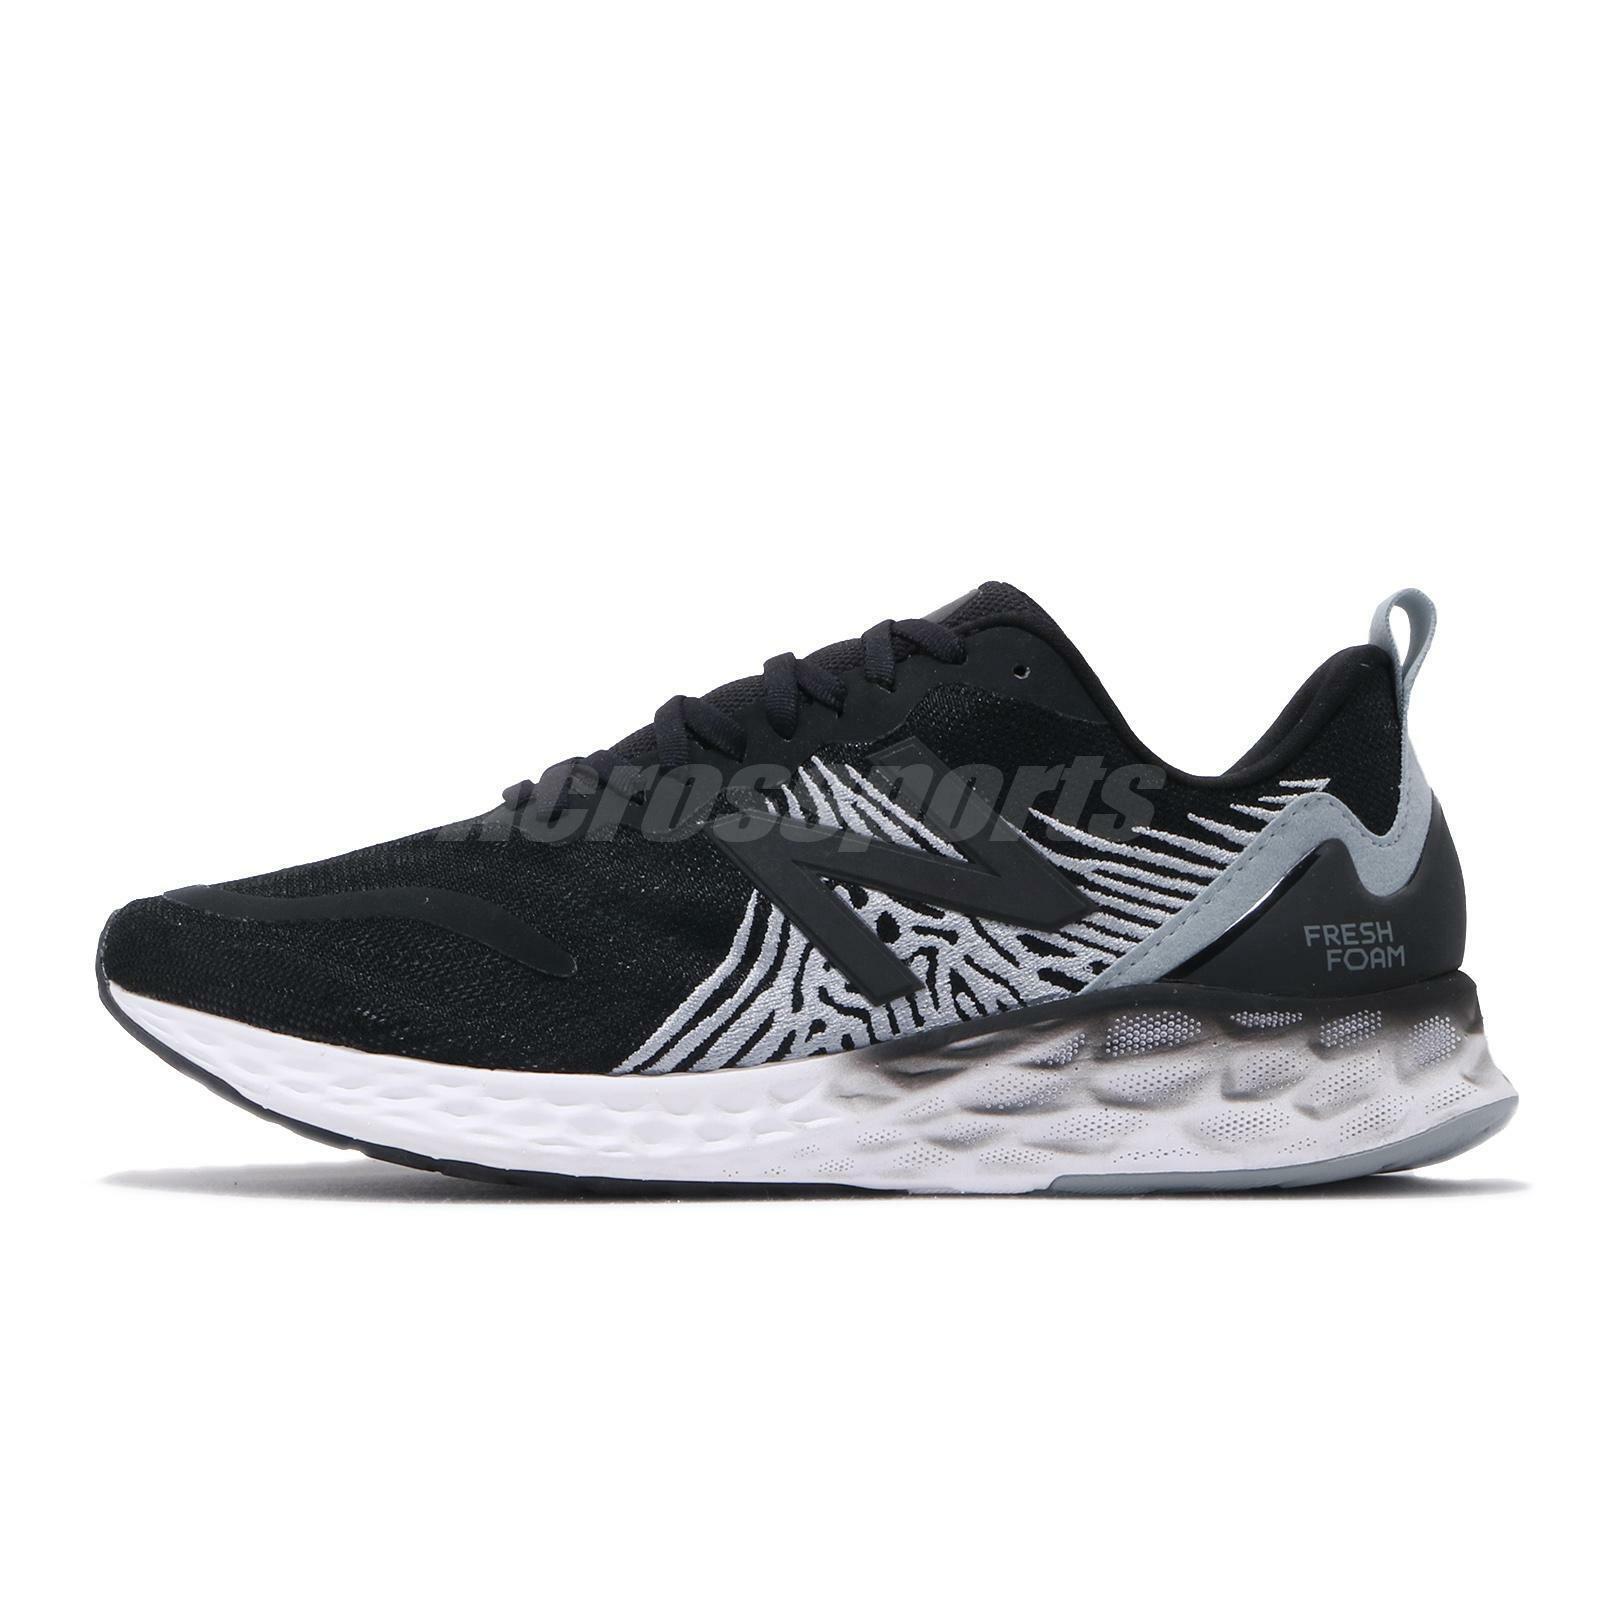 New Balance Fresh Foam X Tempo Wide Black Grey White Men Running Shoe MTMPOBK 2E